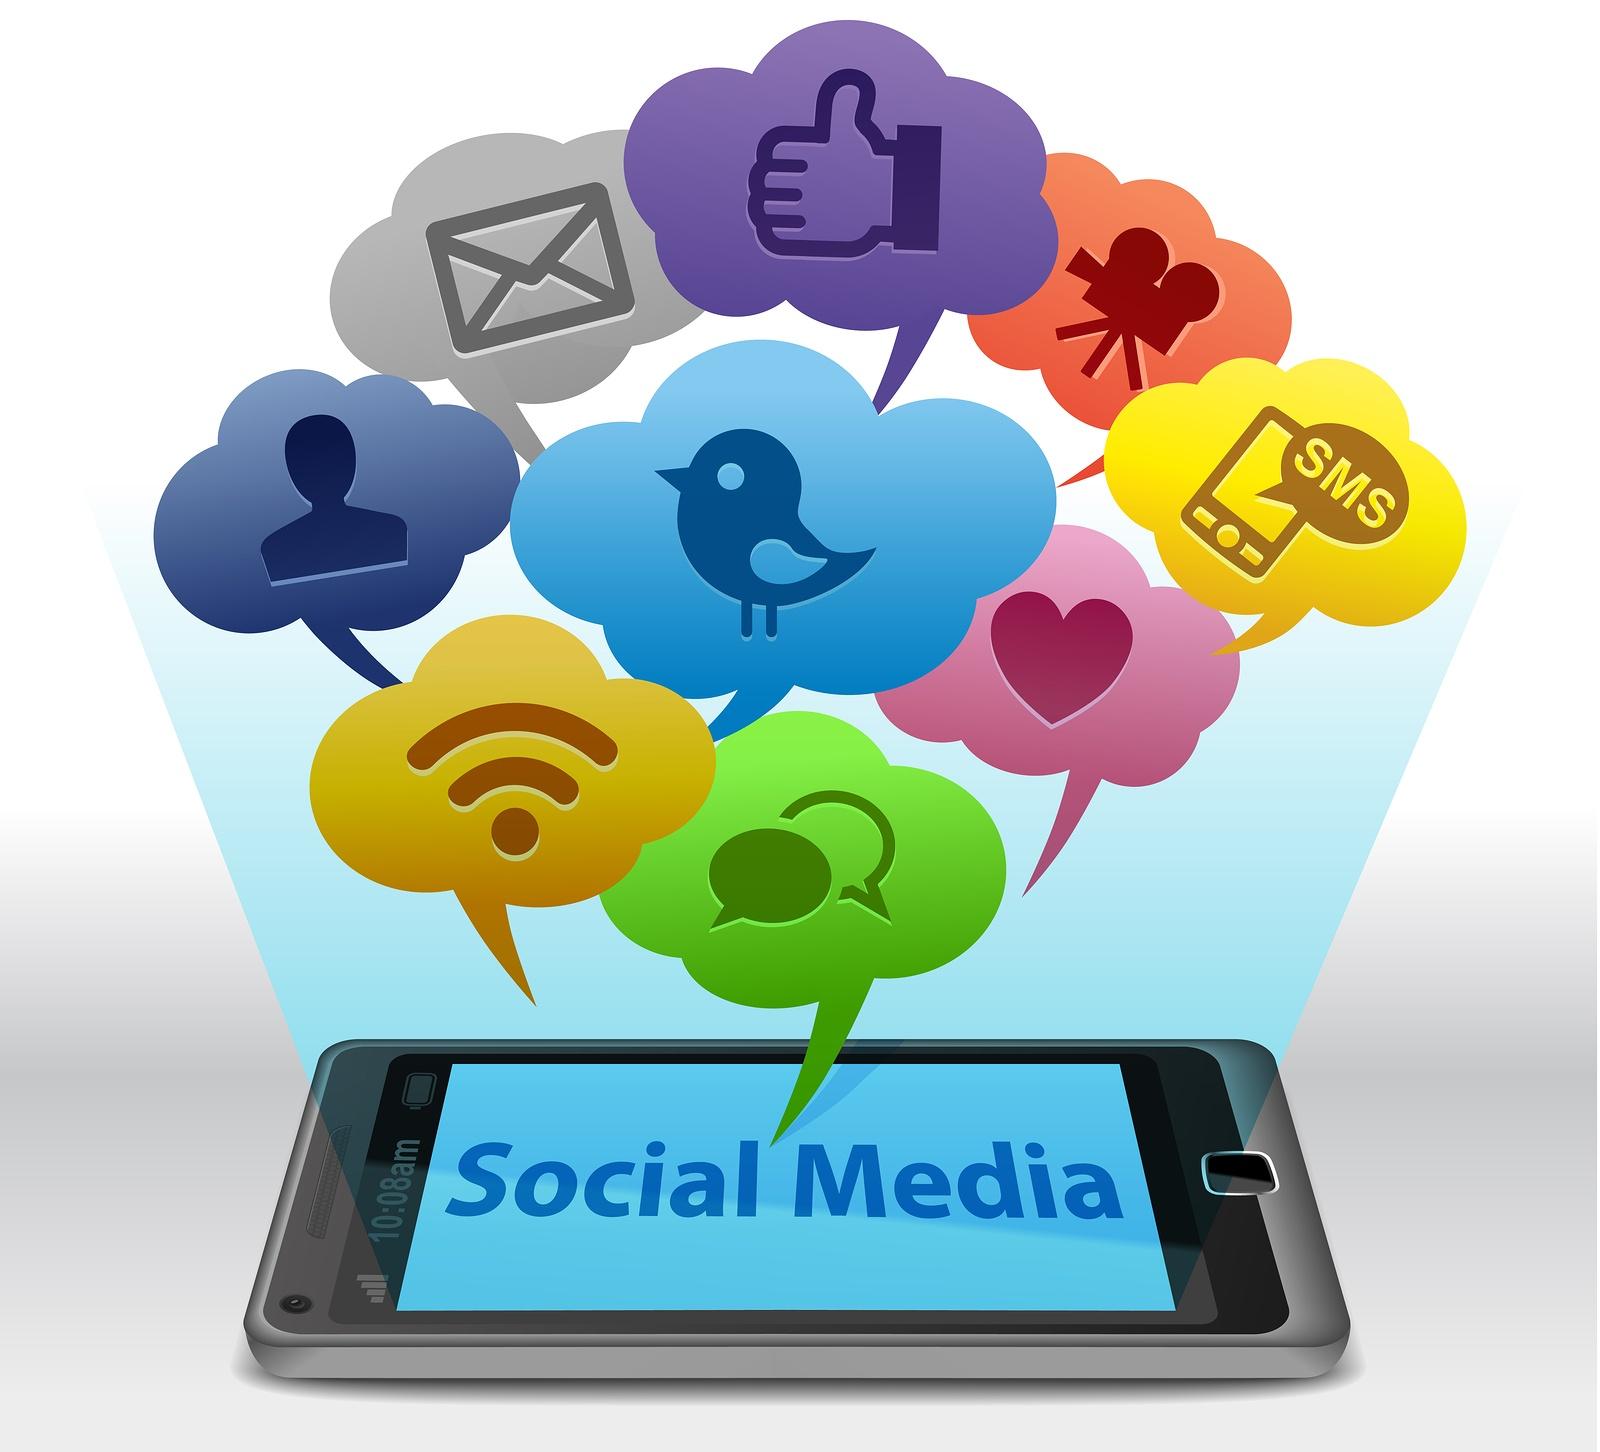 bigstock-Social-media-on-Smartphone-21485075.jpg